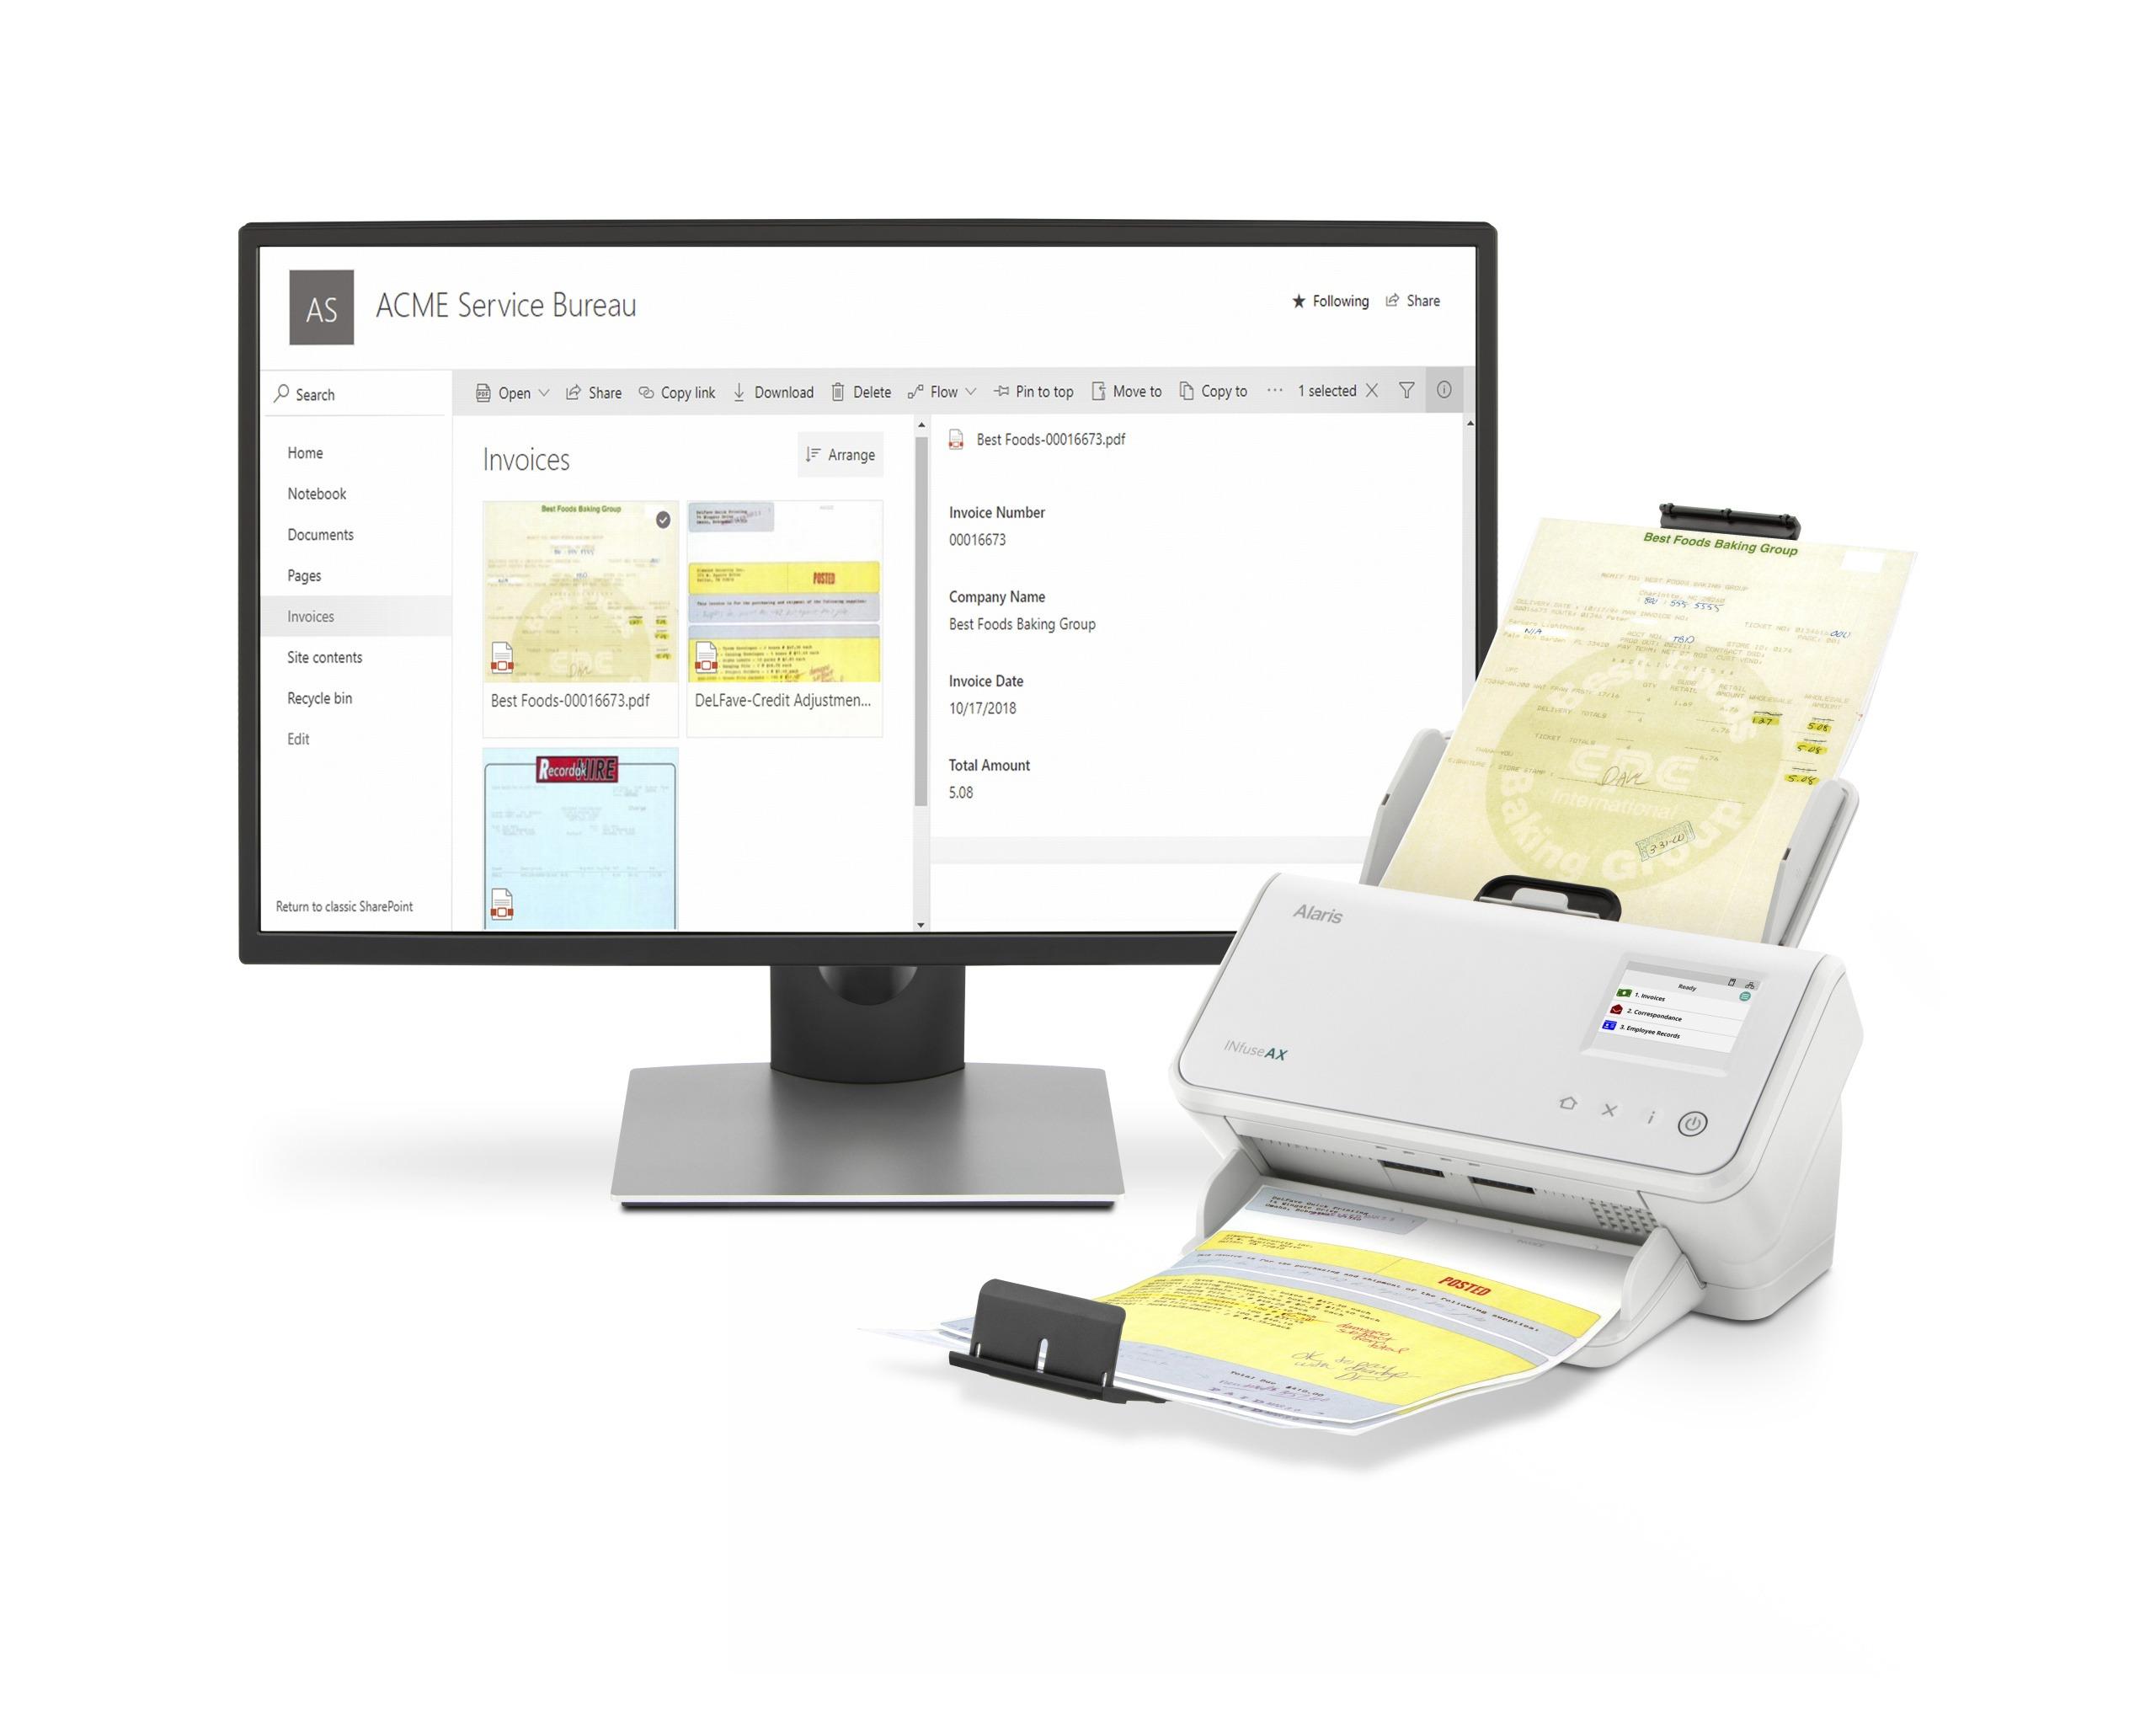 WW_Alaris INfuse AX Scanner product photography – BPO, Service Bureau